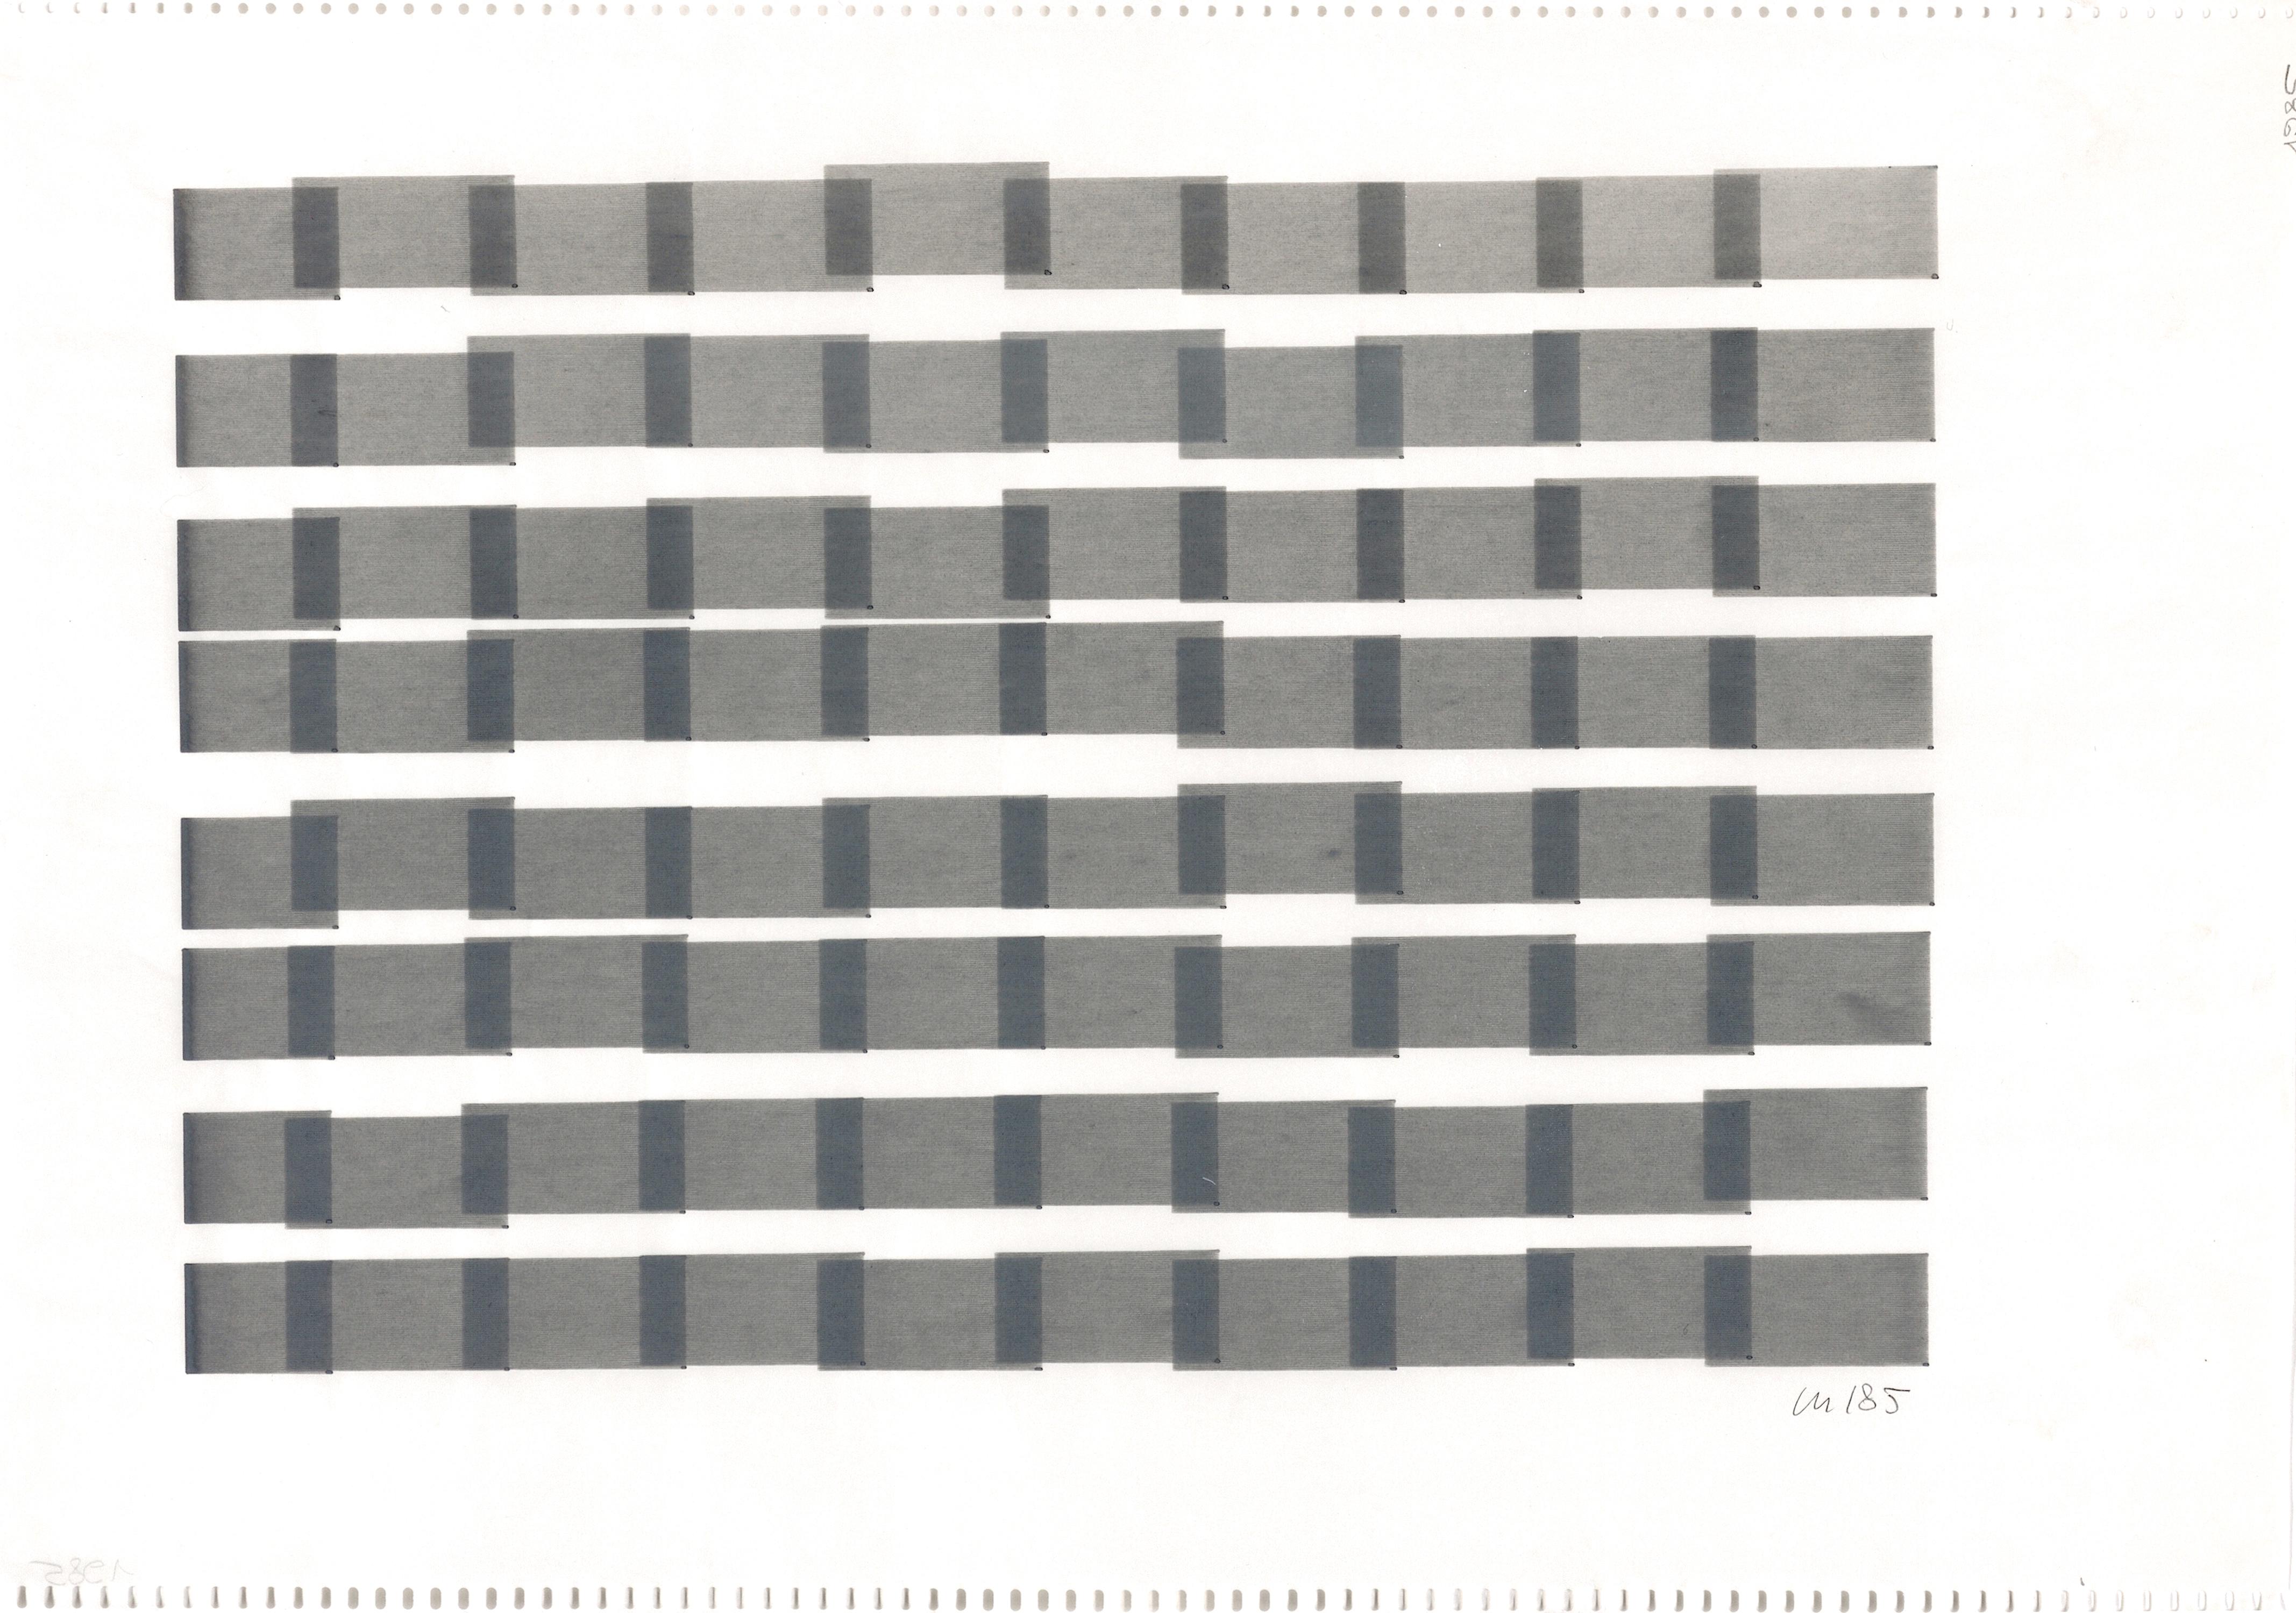 Vera Molnar, 8 Colonnes, plotter drawing, 23 x 32 cm, 1985